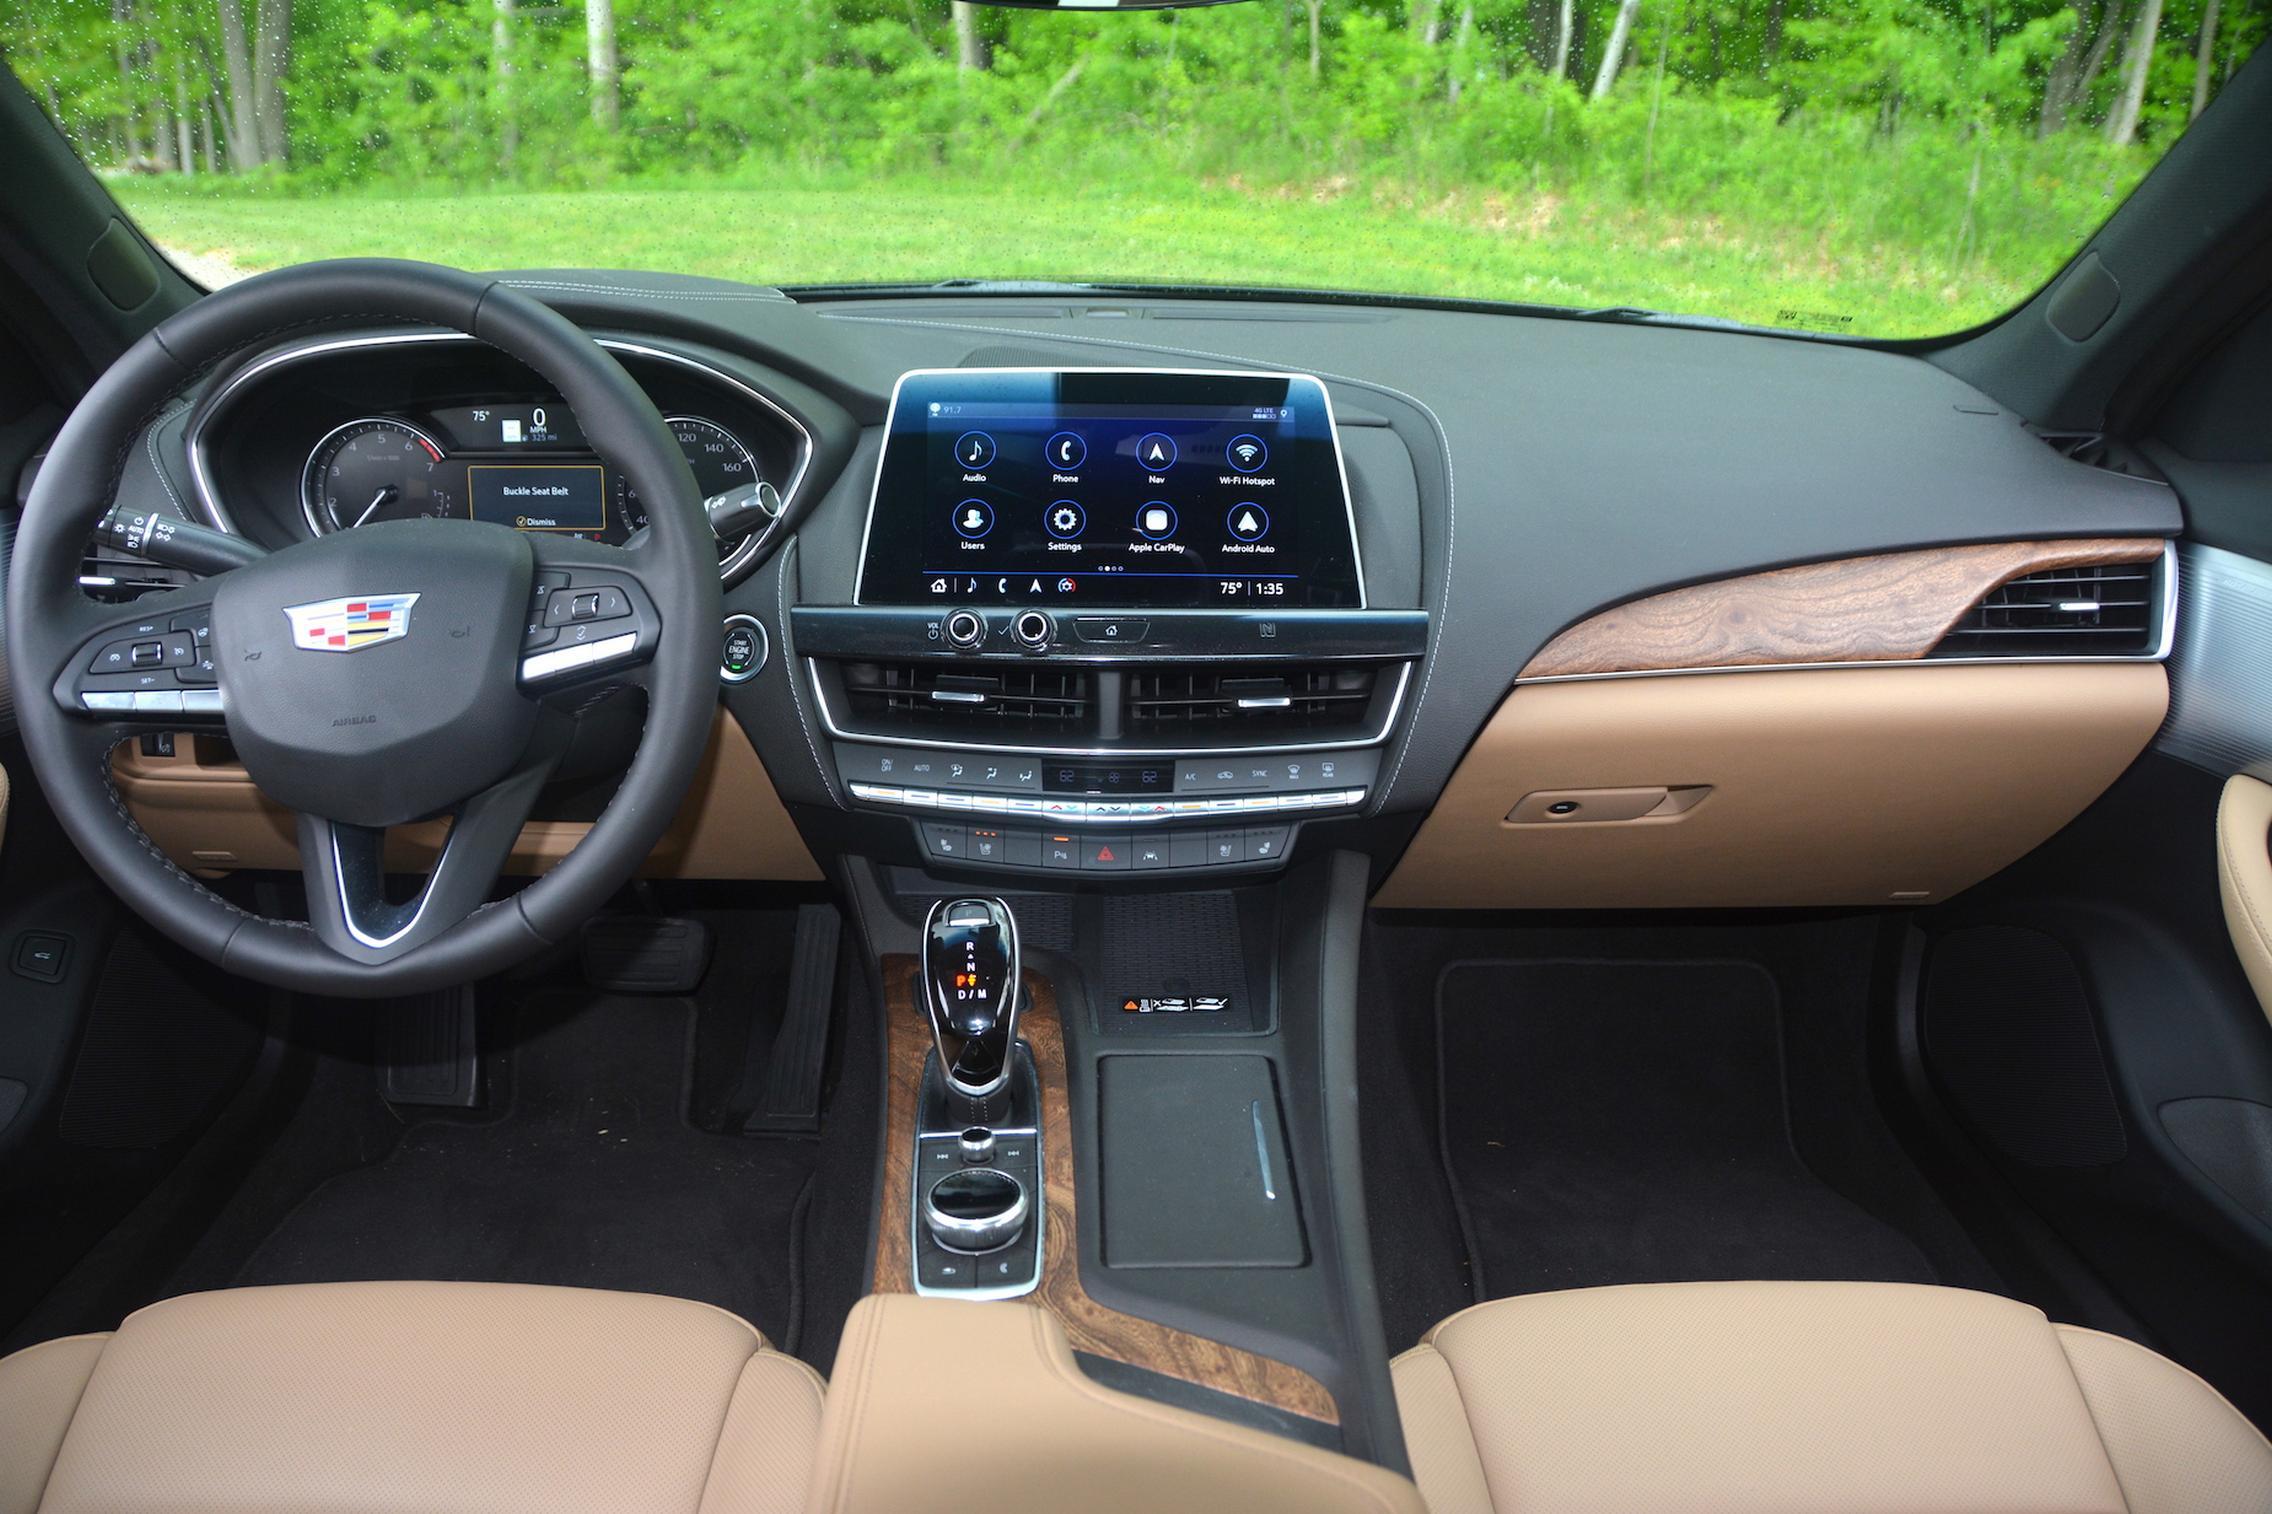 2021 Cadillac CT5 dashboard